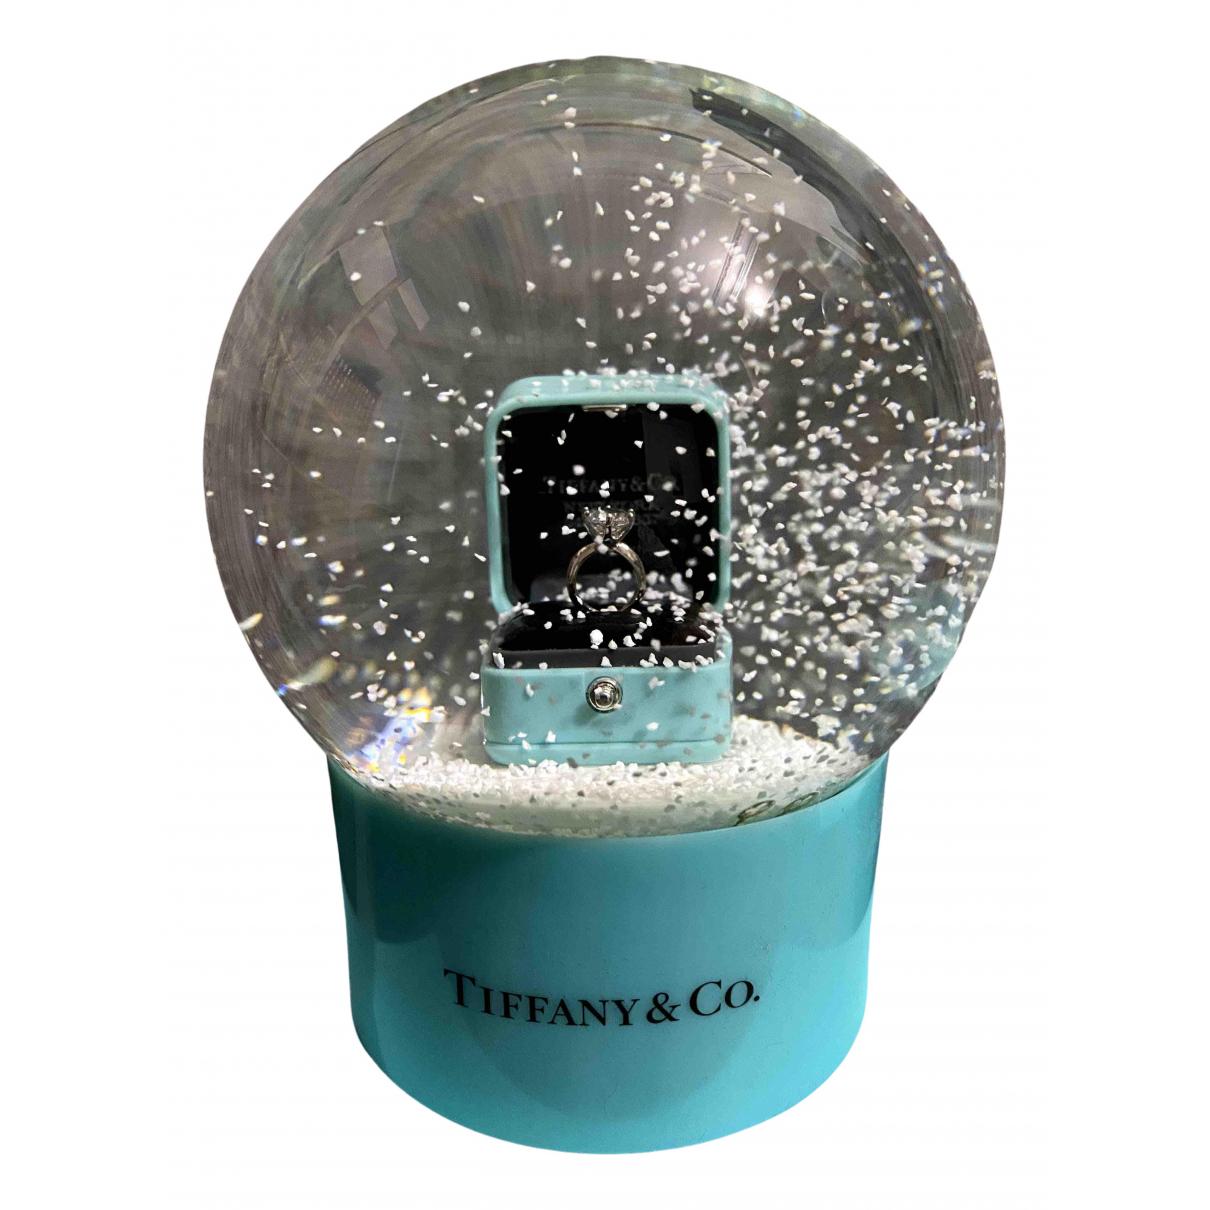 Bola de nieve Tiffany & Co